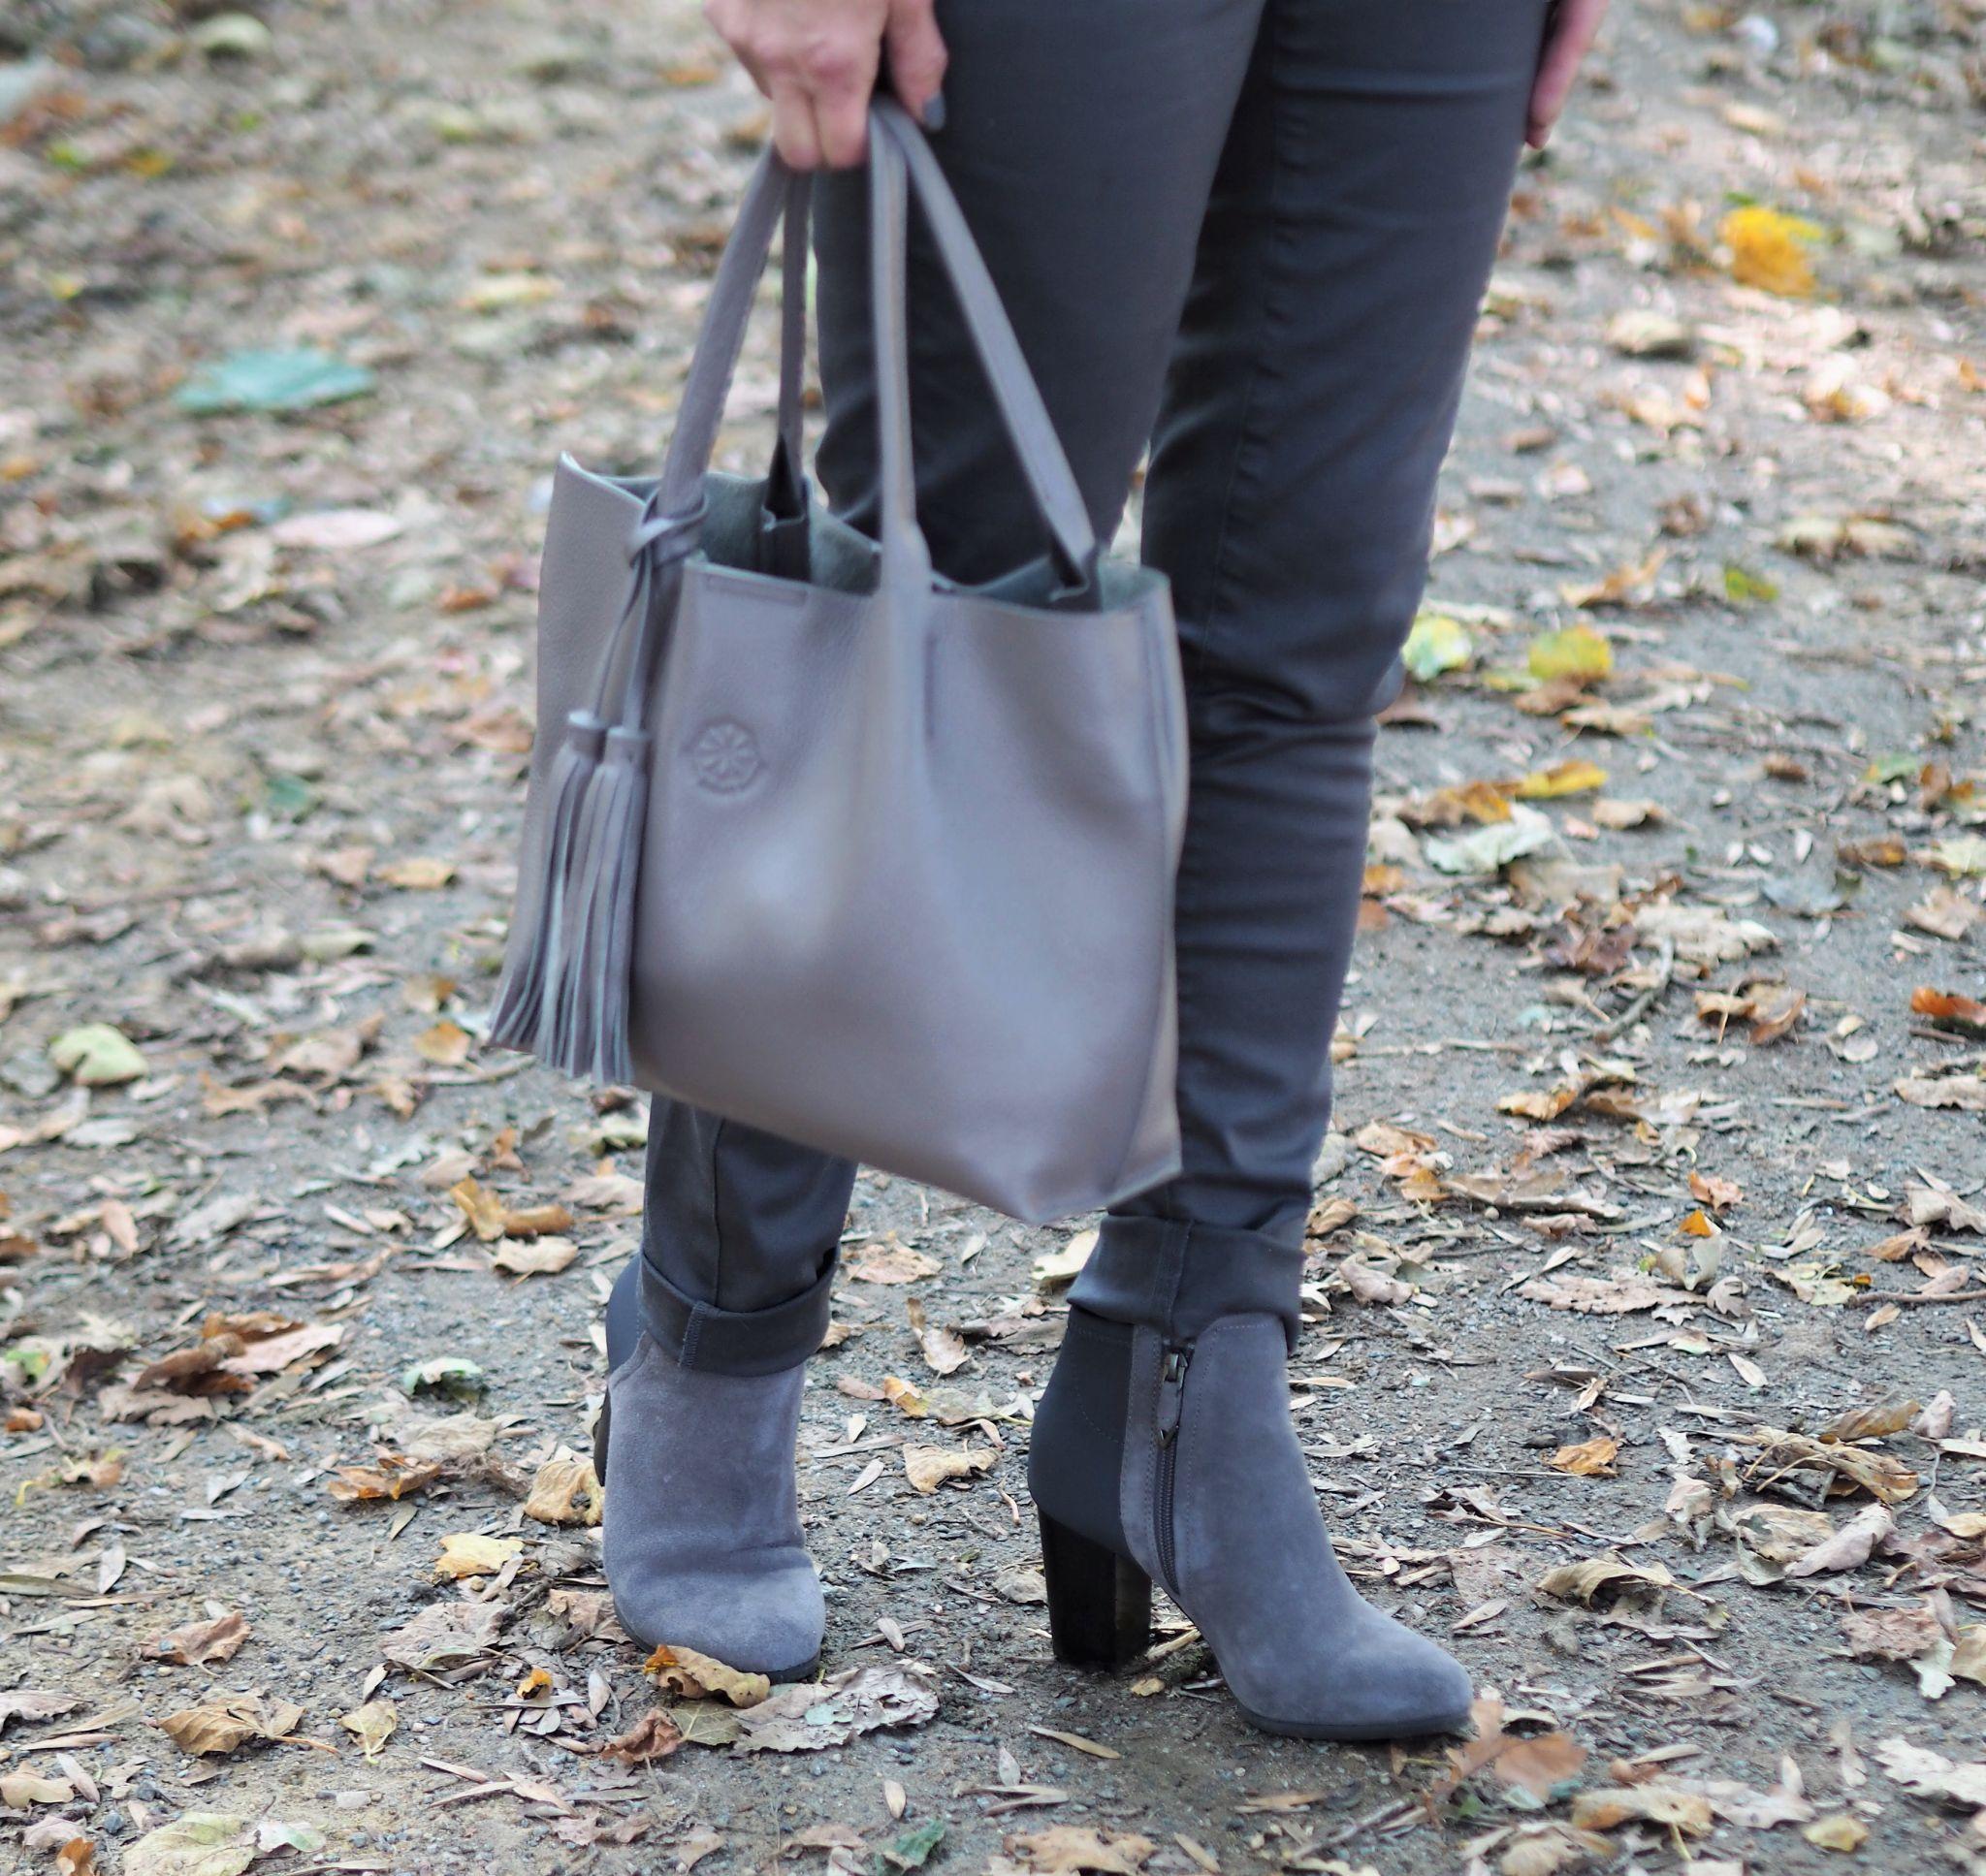 94f18fb08e0 The New Vionic Uk Whitney Boots - Grey, Gris, Grigio! – Vanity & Me